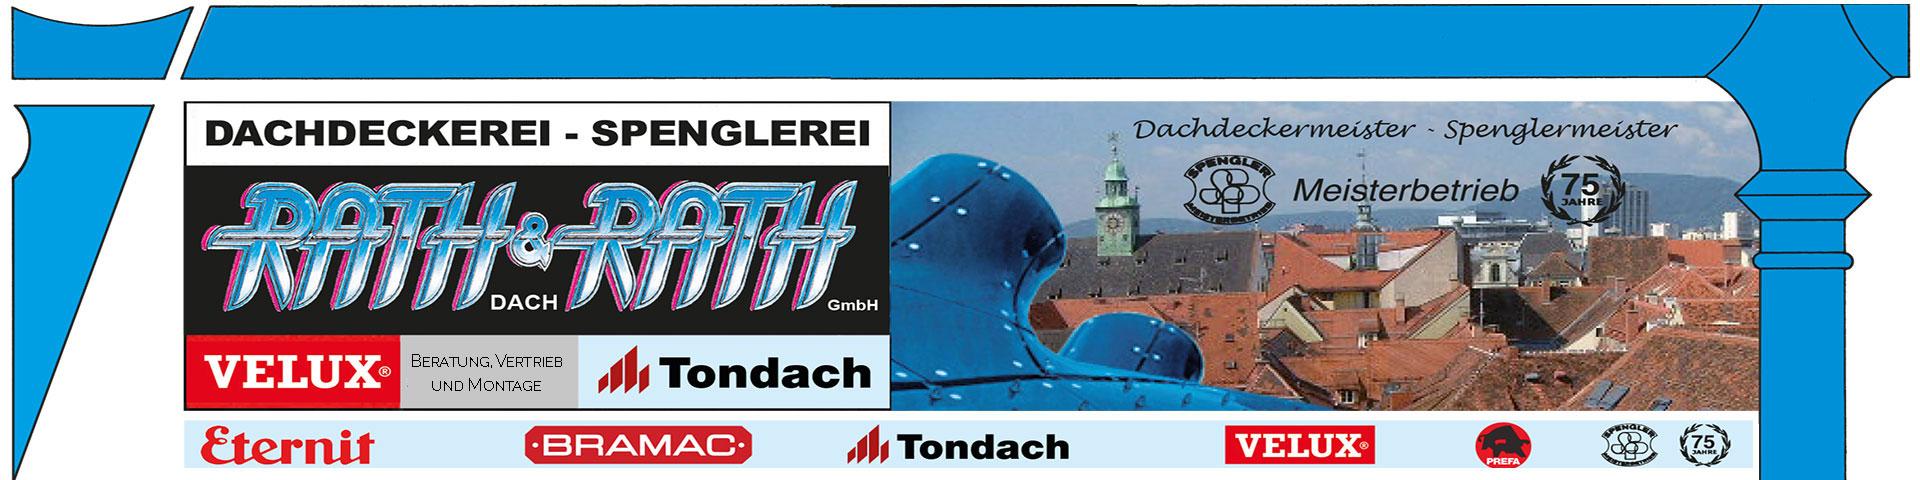 Rath & Rath Dach GmbH – Dachdeckerei – Spenglerei – Graz